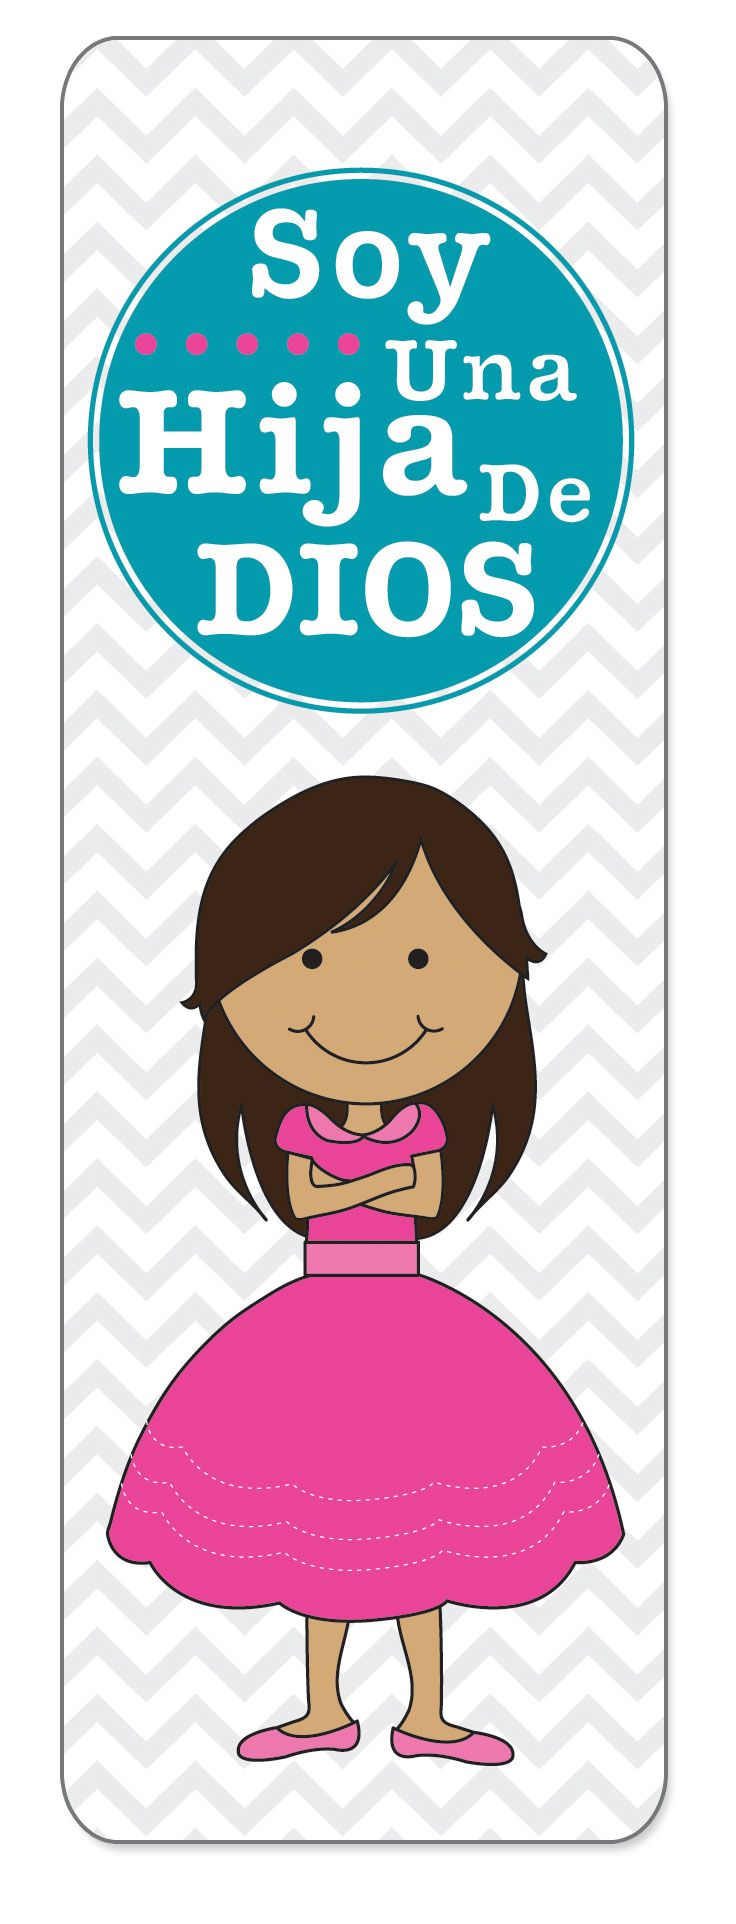 Soy una hija de Dios.   LDS Quotes & Handouts in Spanish   Pinterest ...